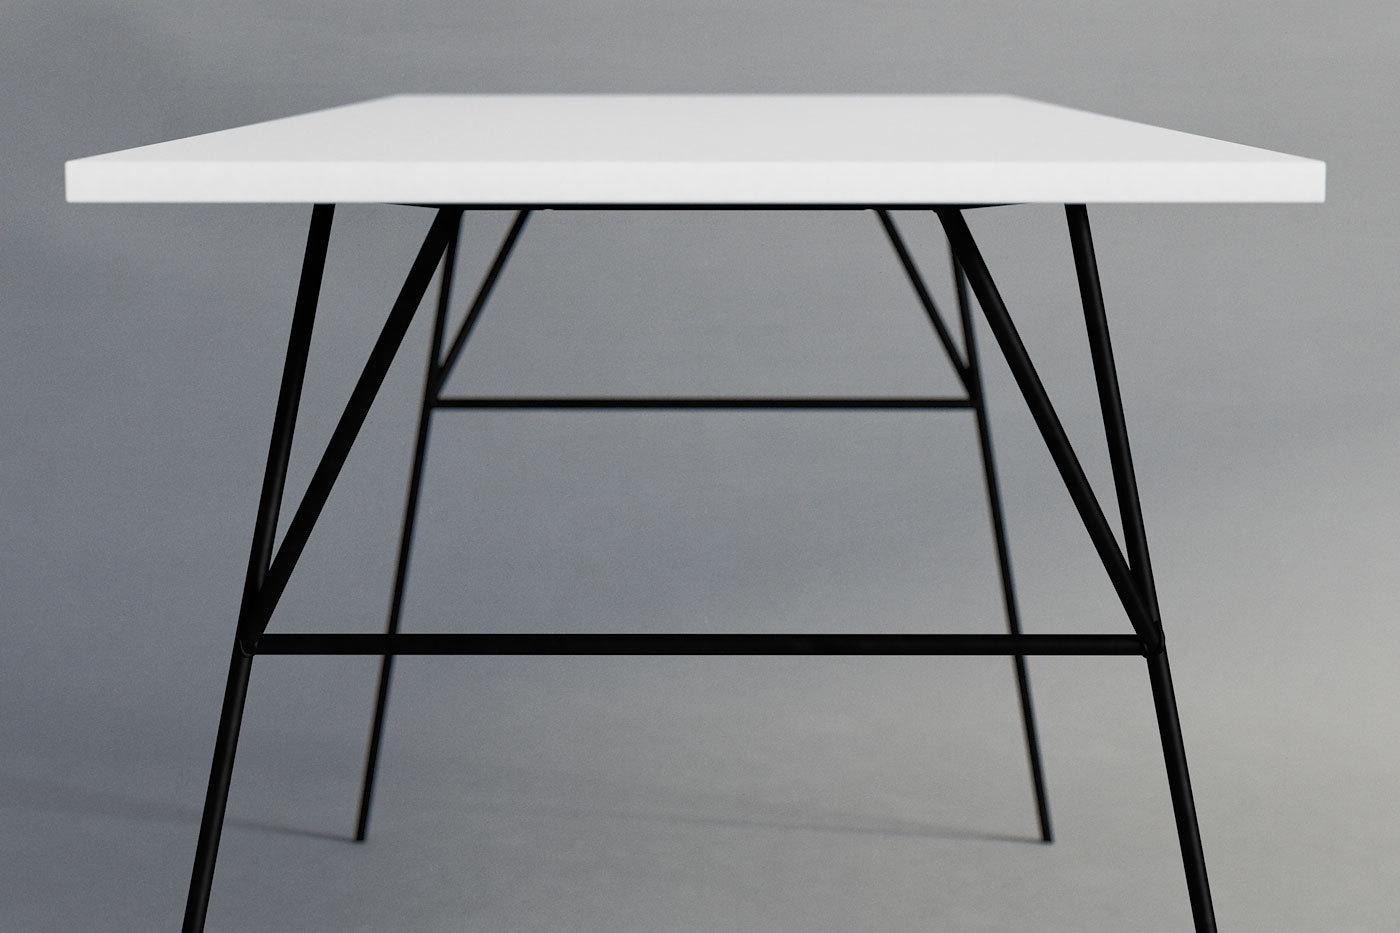 Mobel Accessoires Minimalist : Mobel accessoires minimalist alitopten